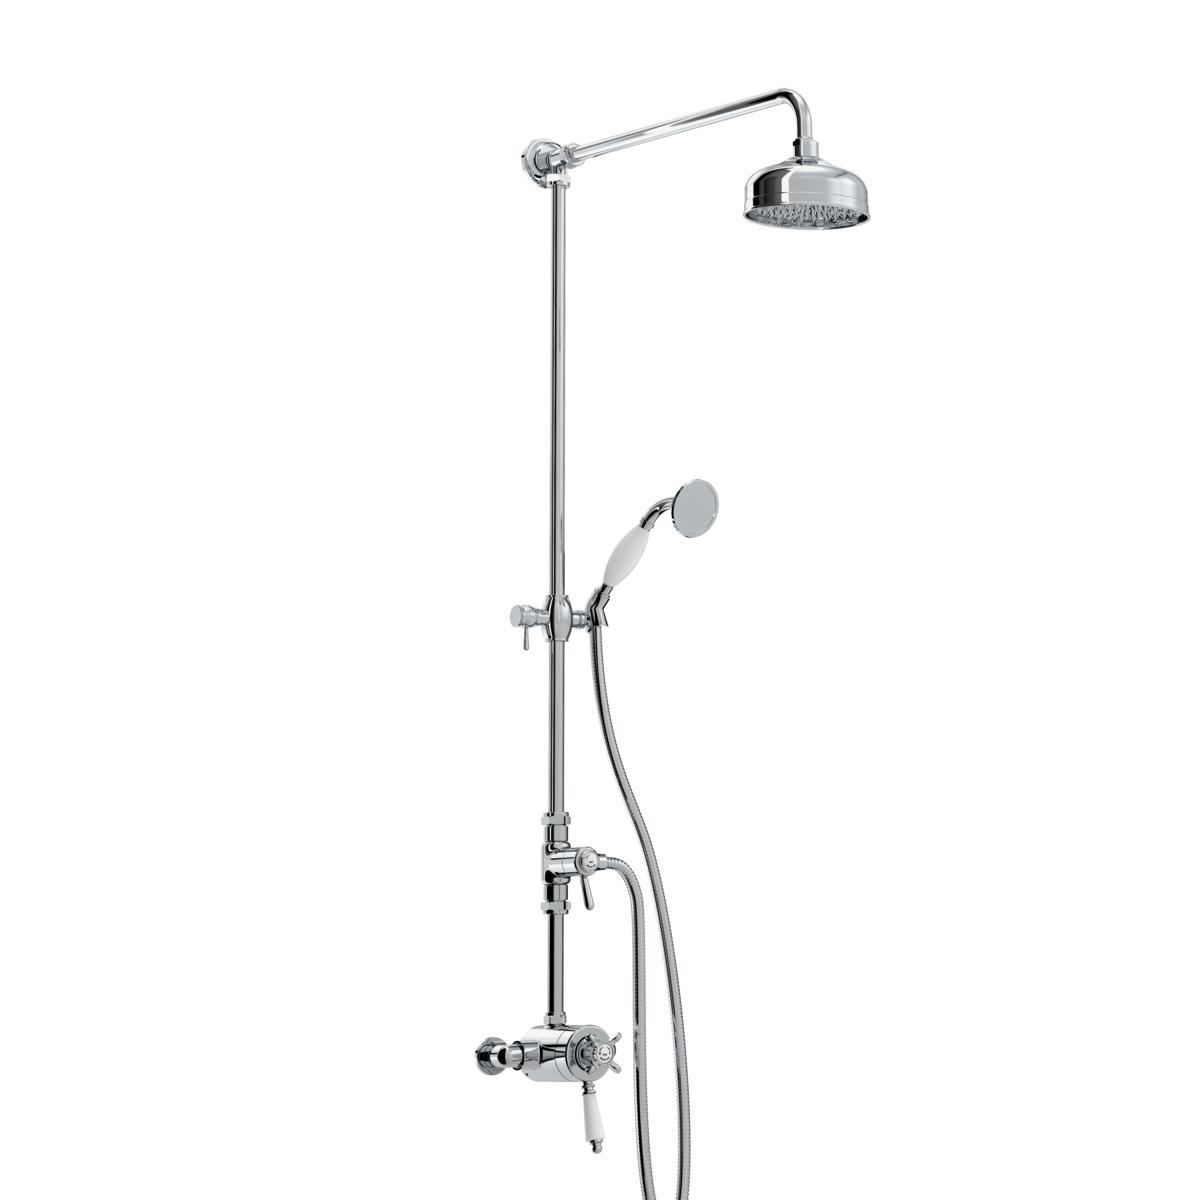 Bristan 1901 N2 CSHXDIV C Concentric Shower